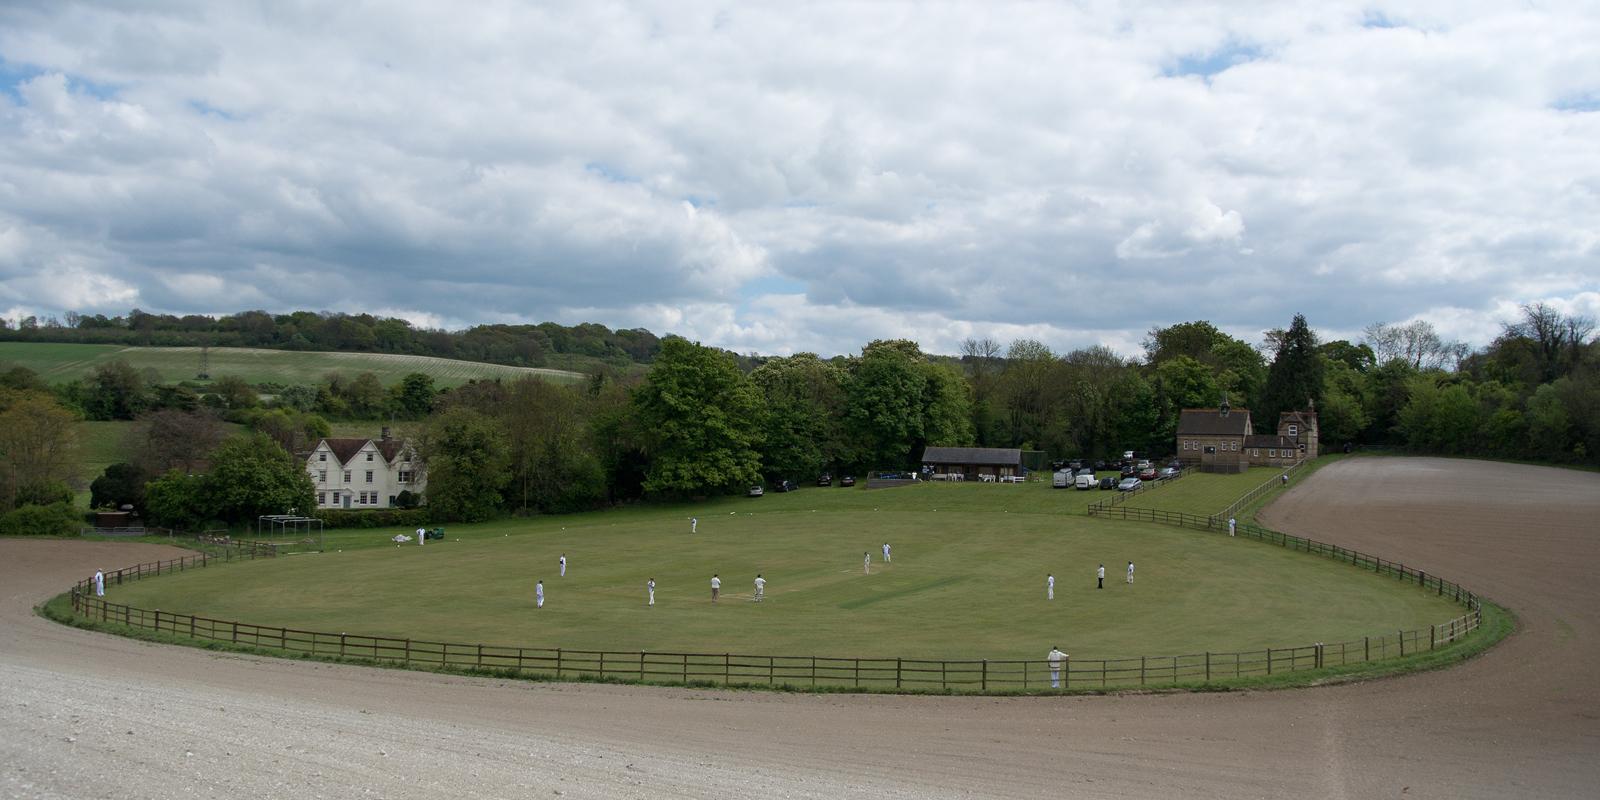 Luddesdowne Cricket Club Cuxton Circular